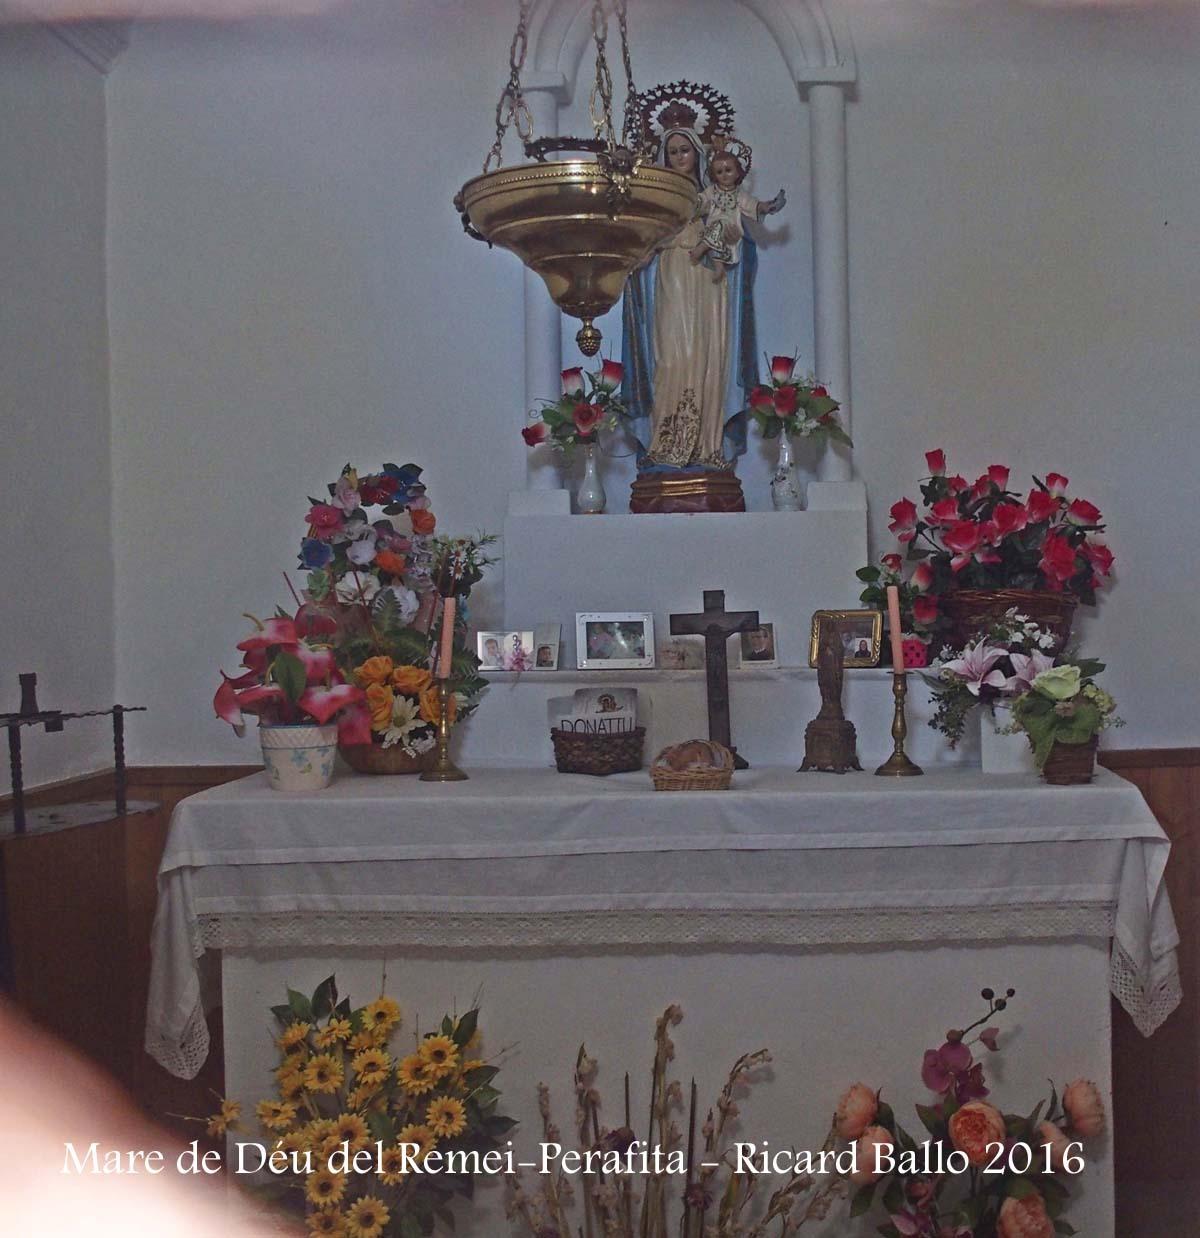 Capella de la Mare de Déu del Remei – Perafita